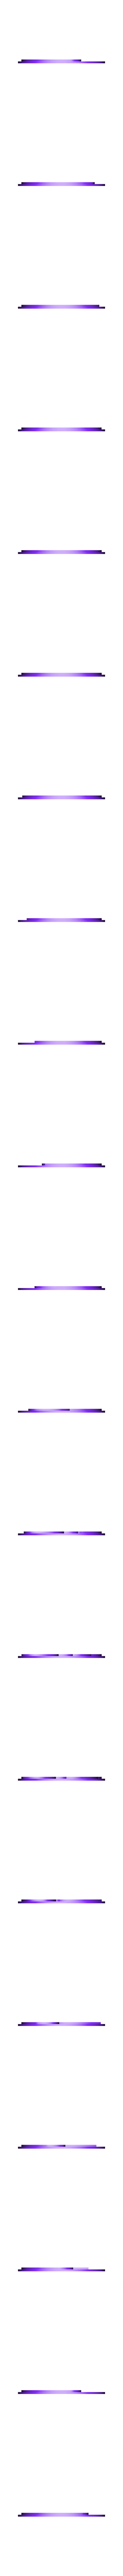 HAWKS_red.STL Download free STL file Minimal Multi-color NBA coasters • 3D print object, MosaicManufacturing